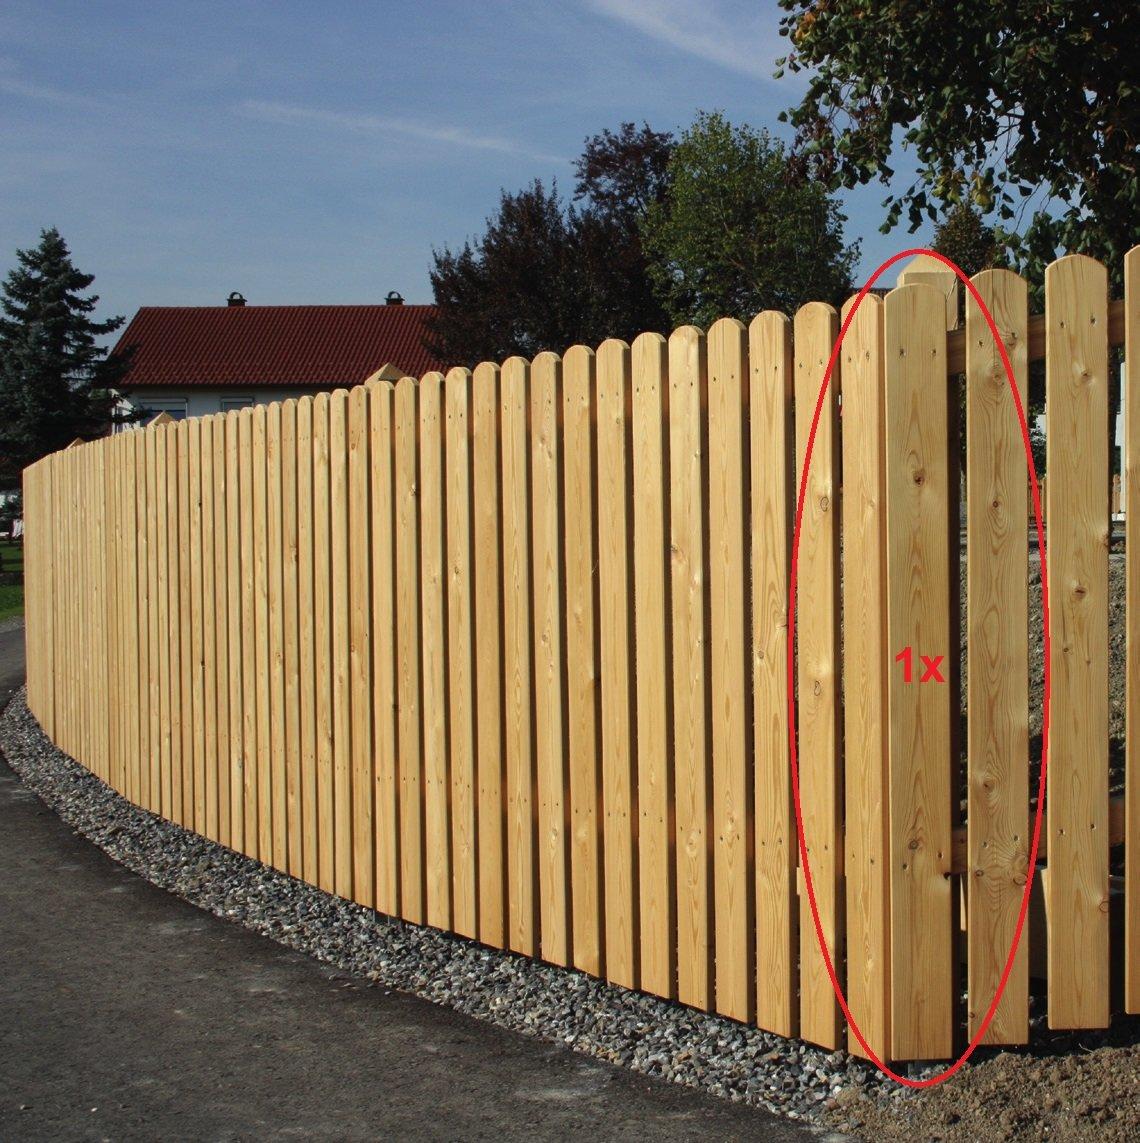 100 Stk Zaunbrett aus Lärchenholz Typ A 20x95mm Länge 100 cm